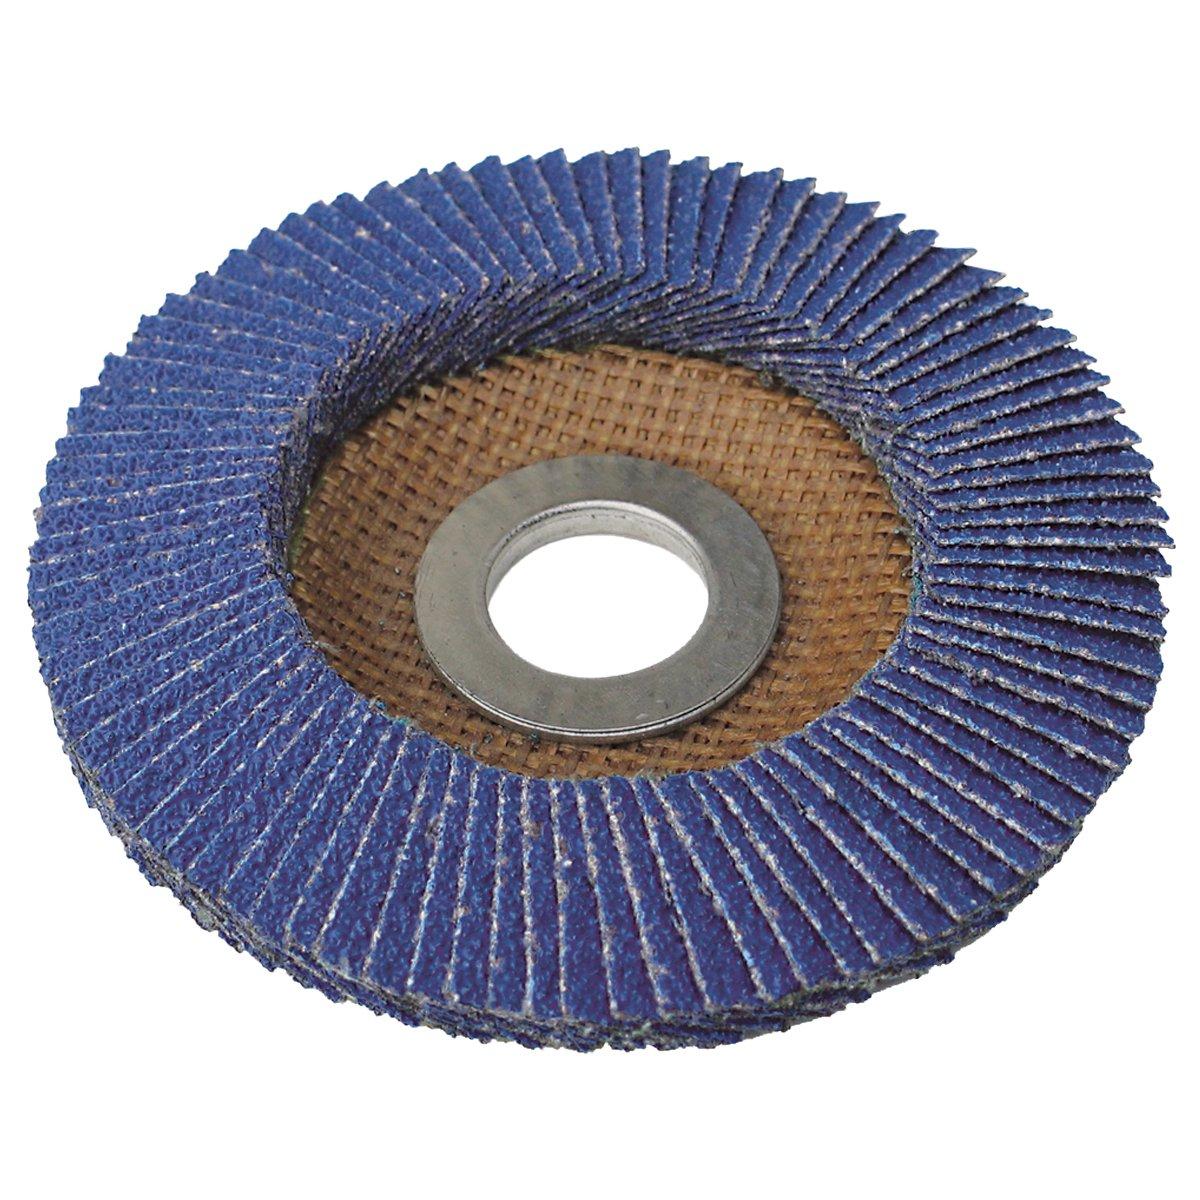 IVY Classic 42220 Flex-Abrasive 7-Inch x 7//8-Inch 80 Grit Medium Zirconia Flap Disc